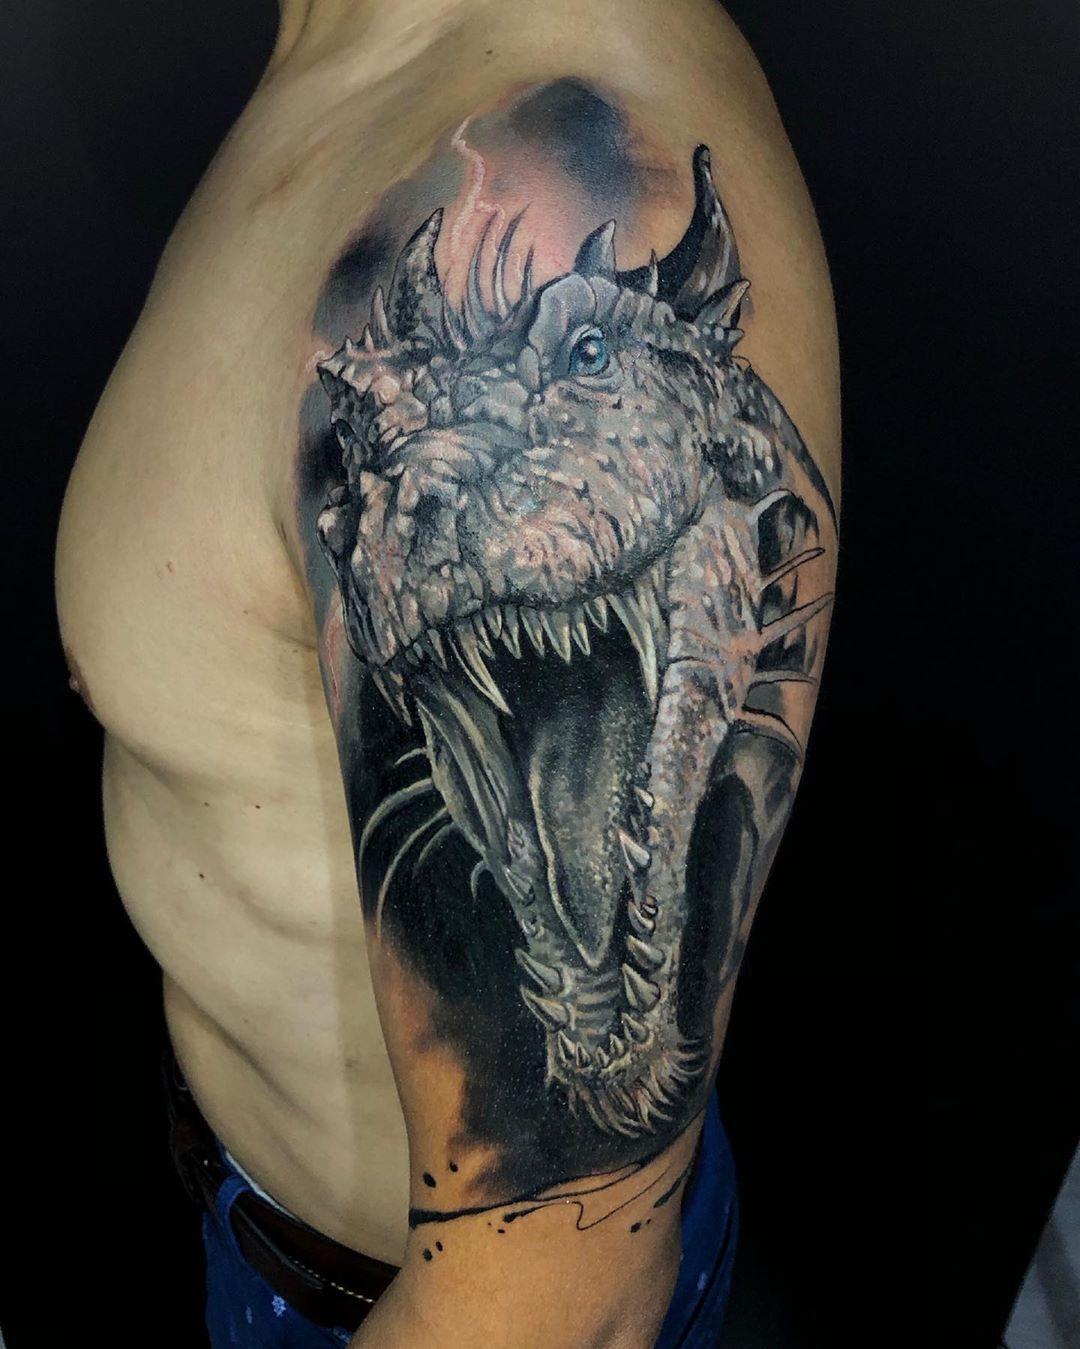 Entretenida cobertura, tatuado en @blackcrown_cl [Agenda abierta] . . . . . . . .  #tattoo #tattoist #tatuador #tattooart #tattooist #tattooshop #tattoochile #tattoocolor #tatuajechileno #tattoochileno #ink #inked #instattoo #instachile #tattooja #wings #boystattoo #girltattoo #wathercolortattoo #maptattoo #freehand #freehandtattoo #fullcolor #futboltattoo #paisaje #tatuaje #landscape #landscapetattoo #animaltattoo